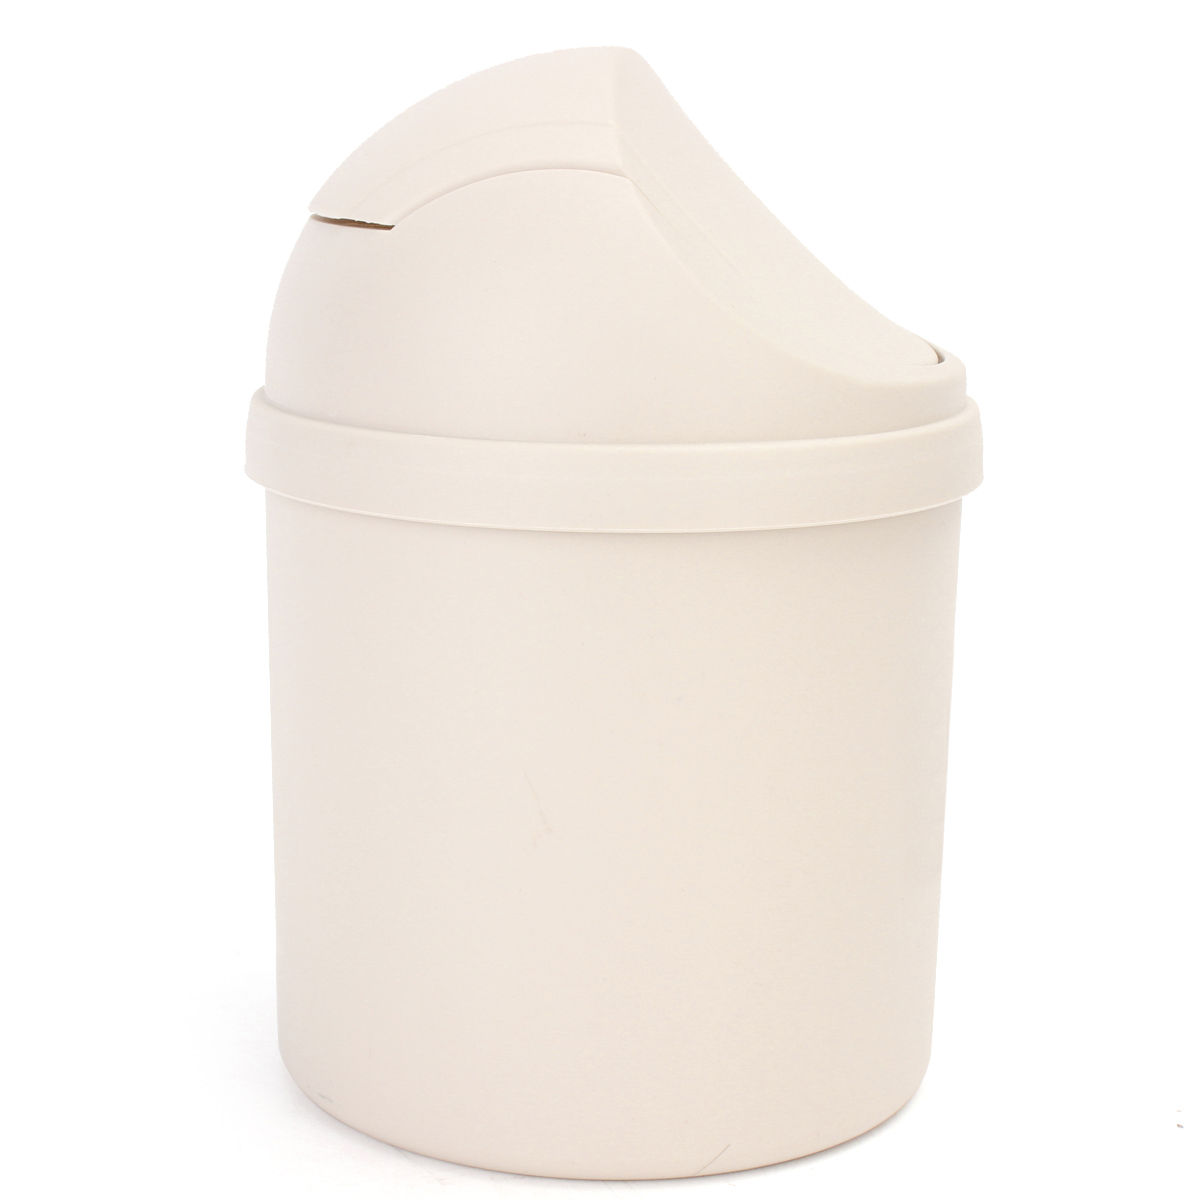 Mini Small Waste Bin Desktop Garbage Basket Table Trash